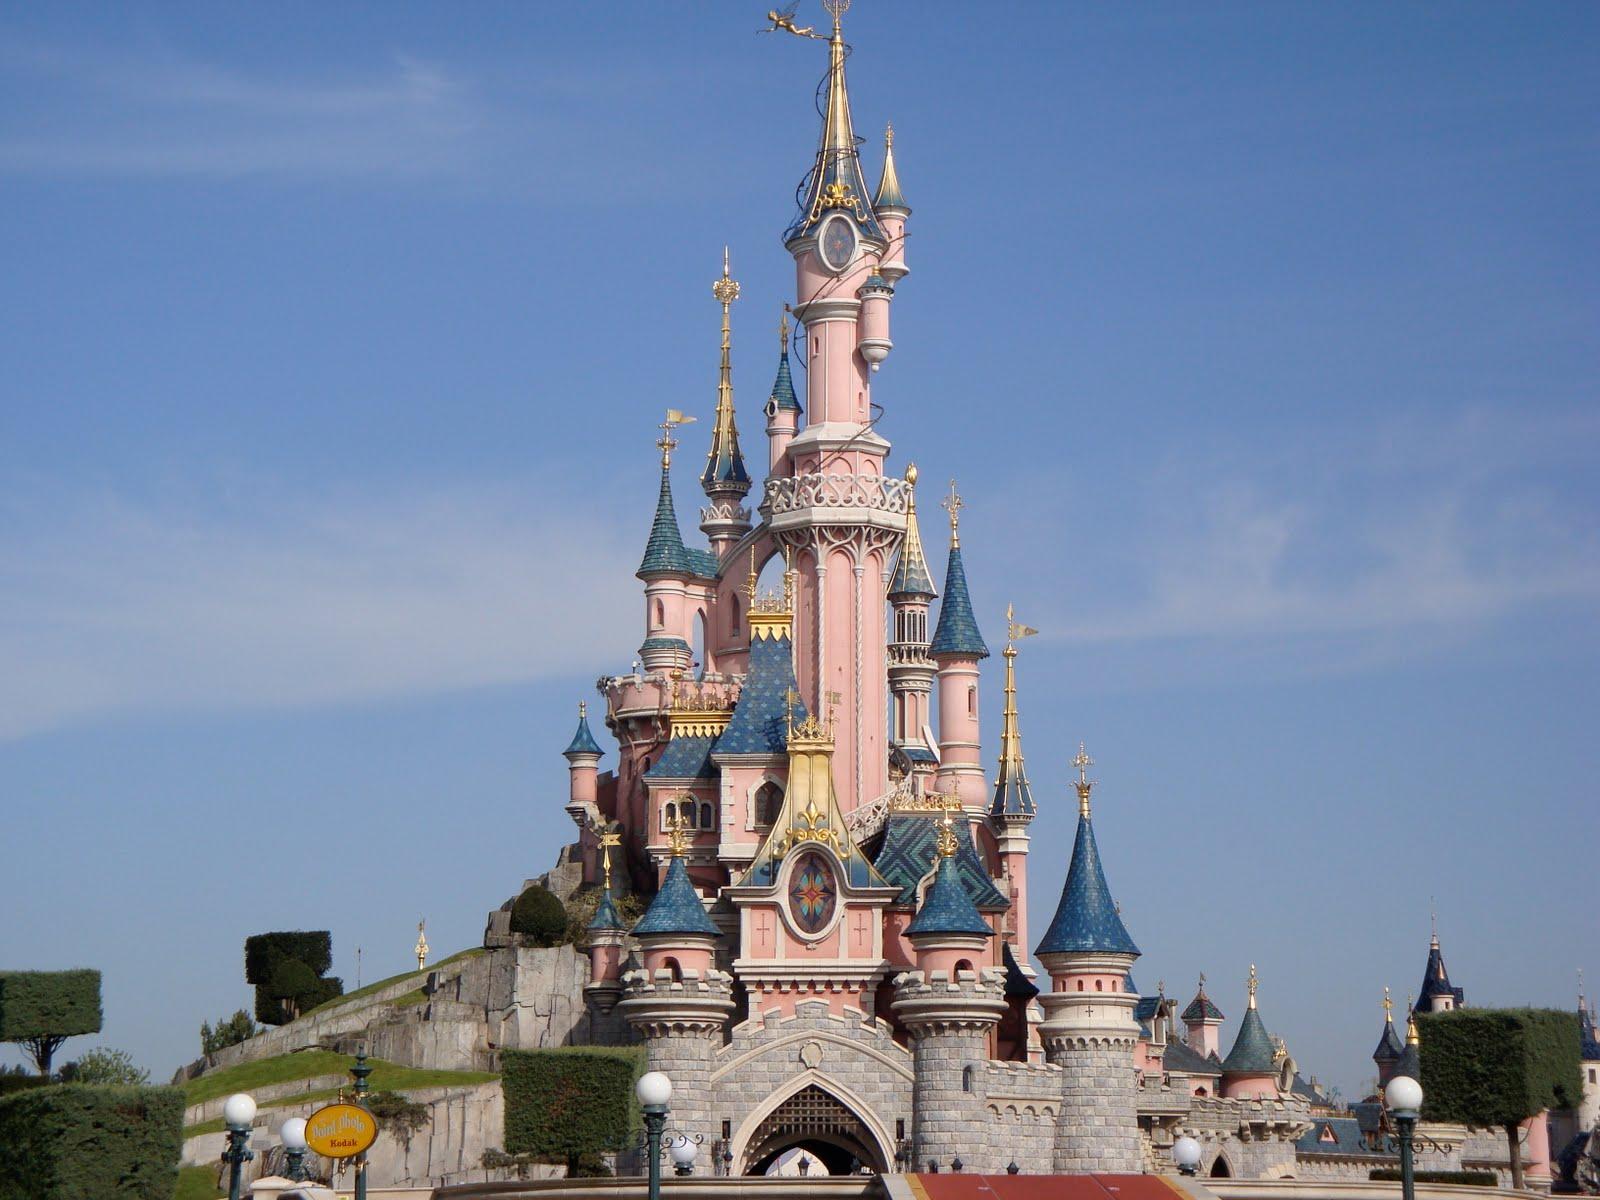 Tallest Tower Disney Castle